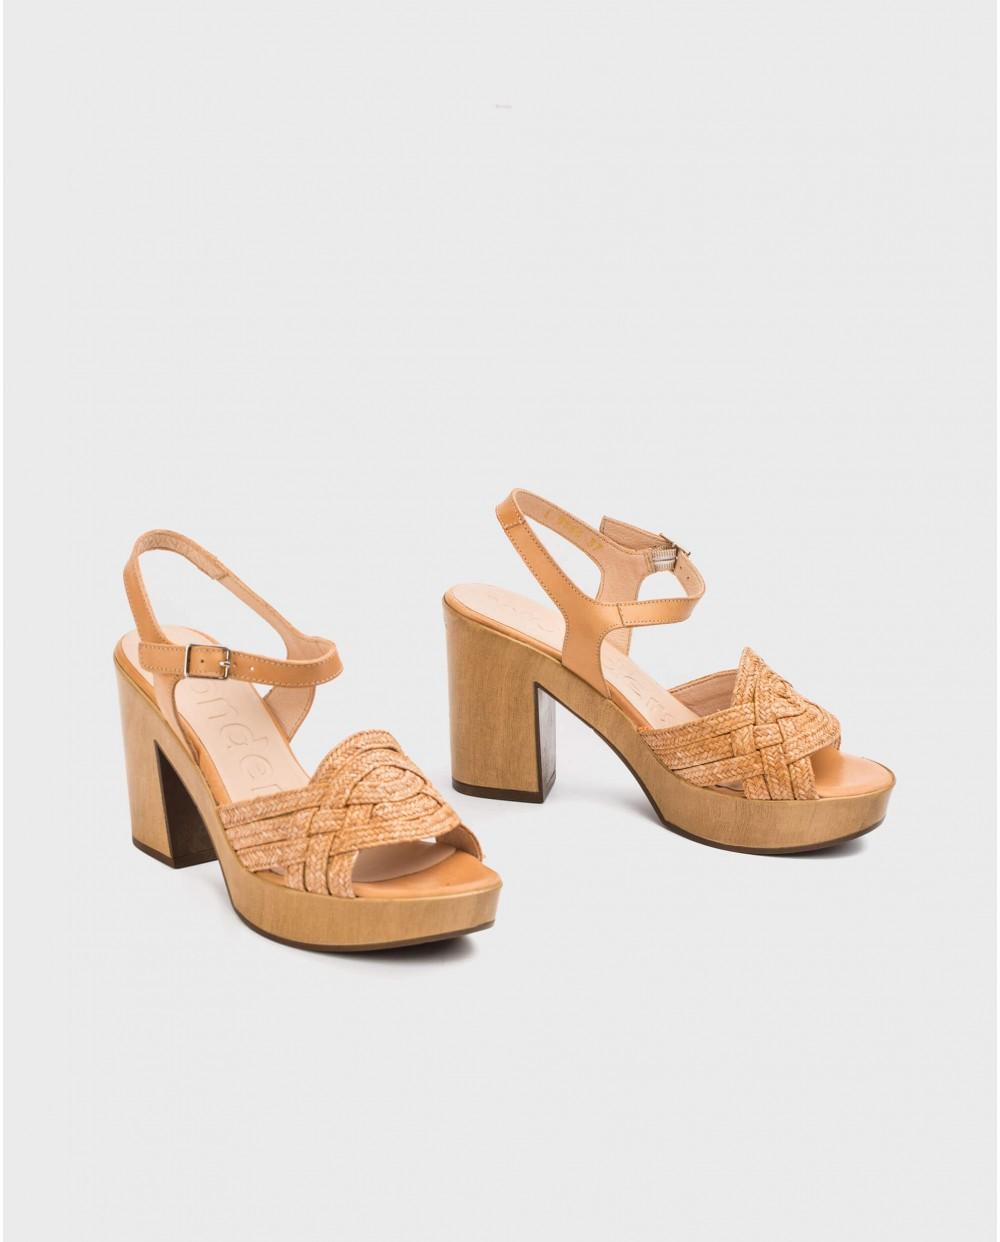 Wonders-Outlet-Platform sandal in jute